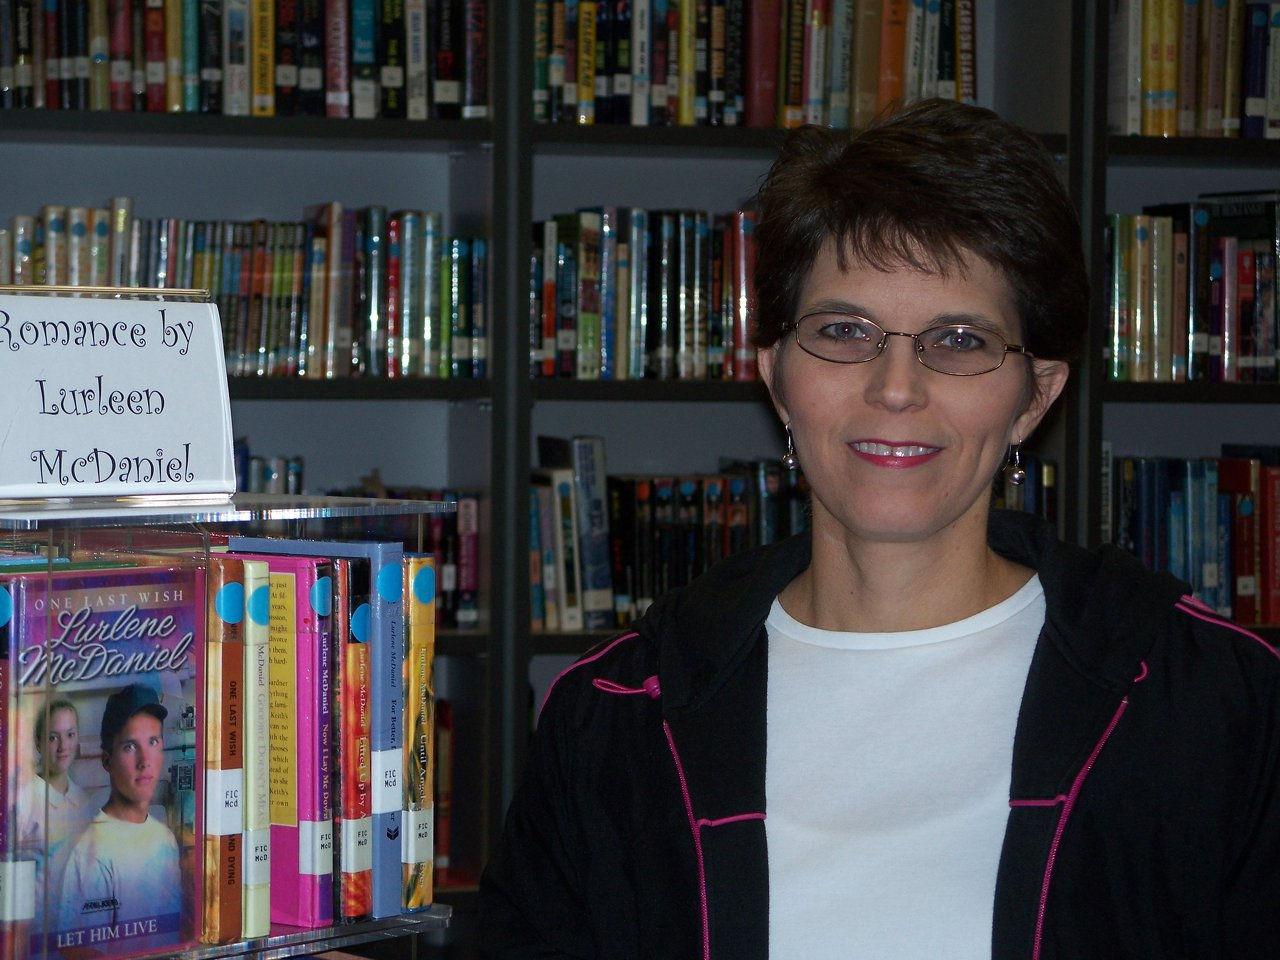 Kristin S. Media Specialist